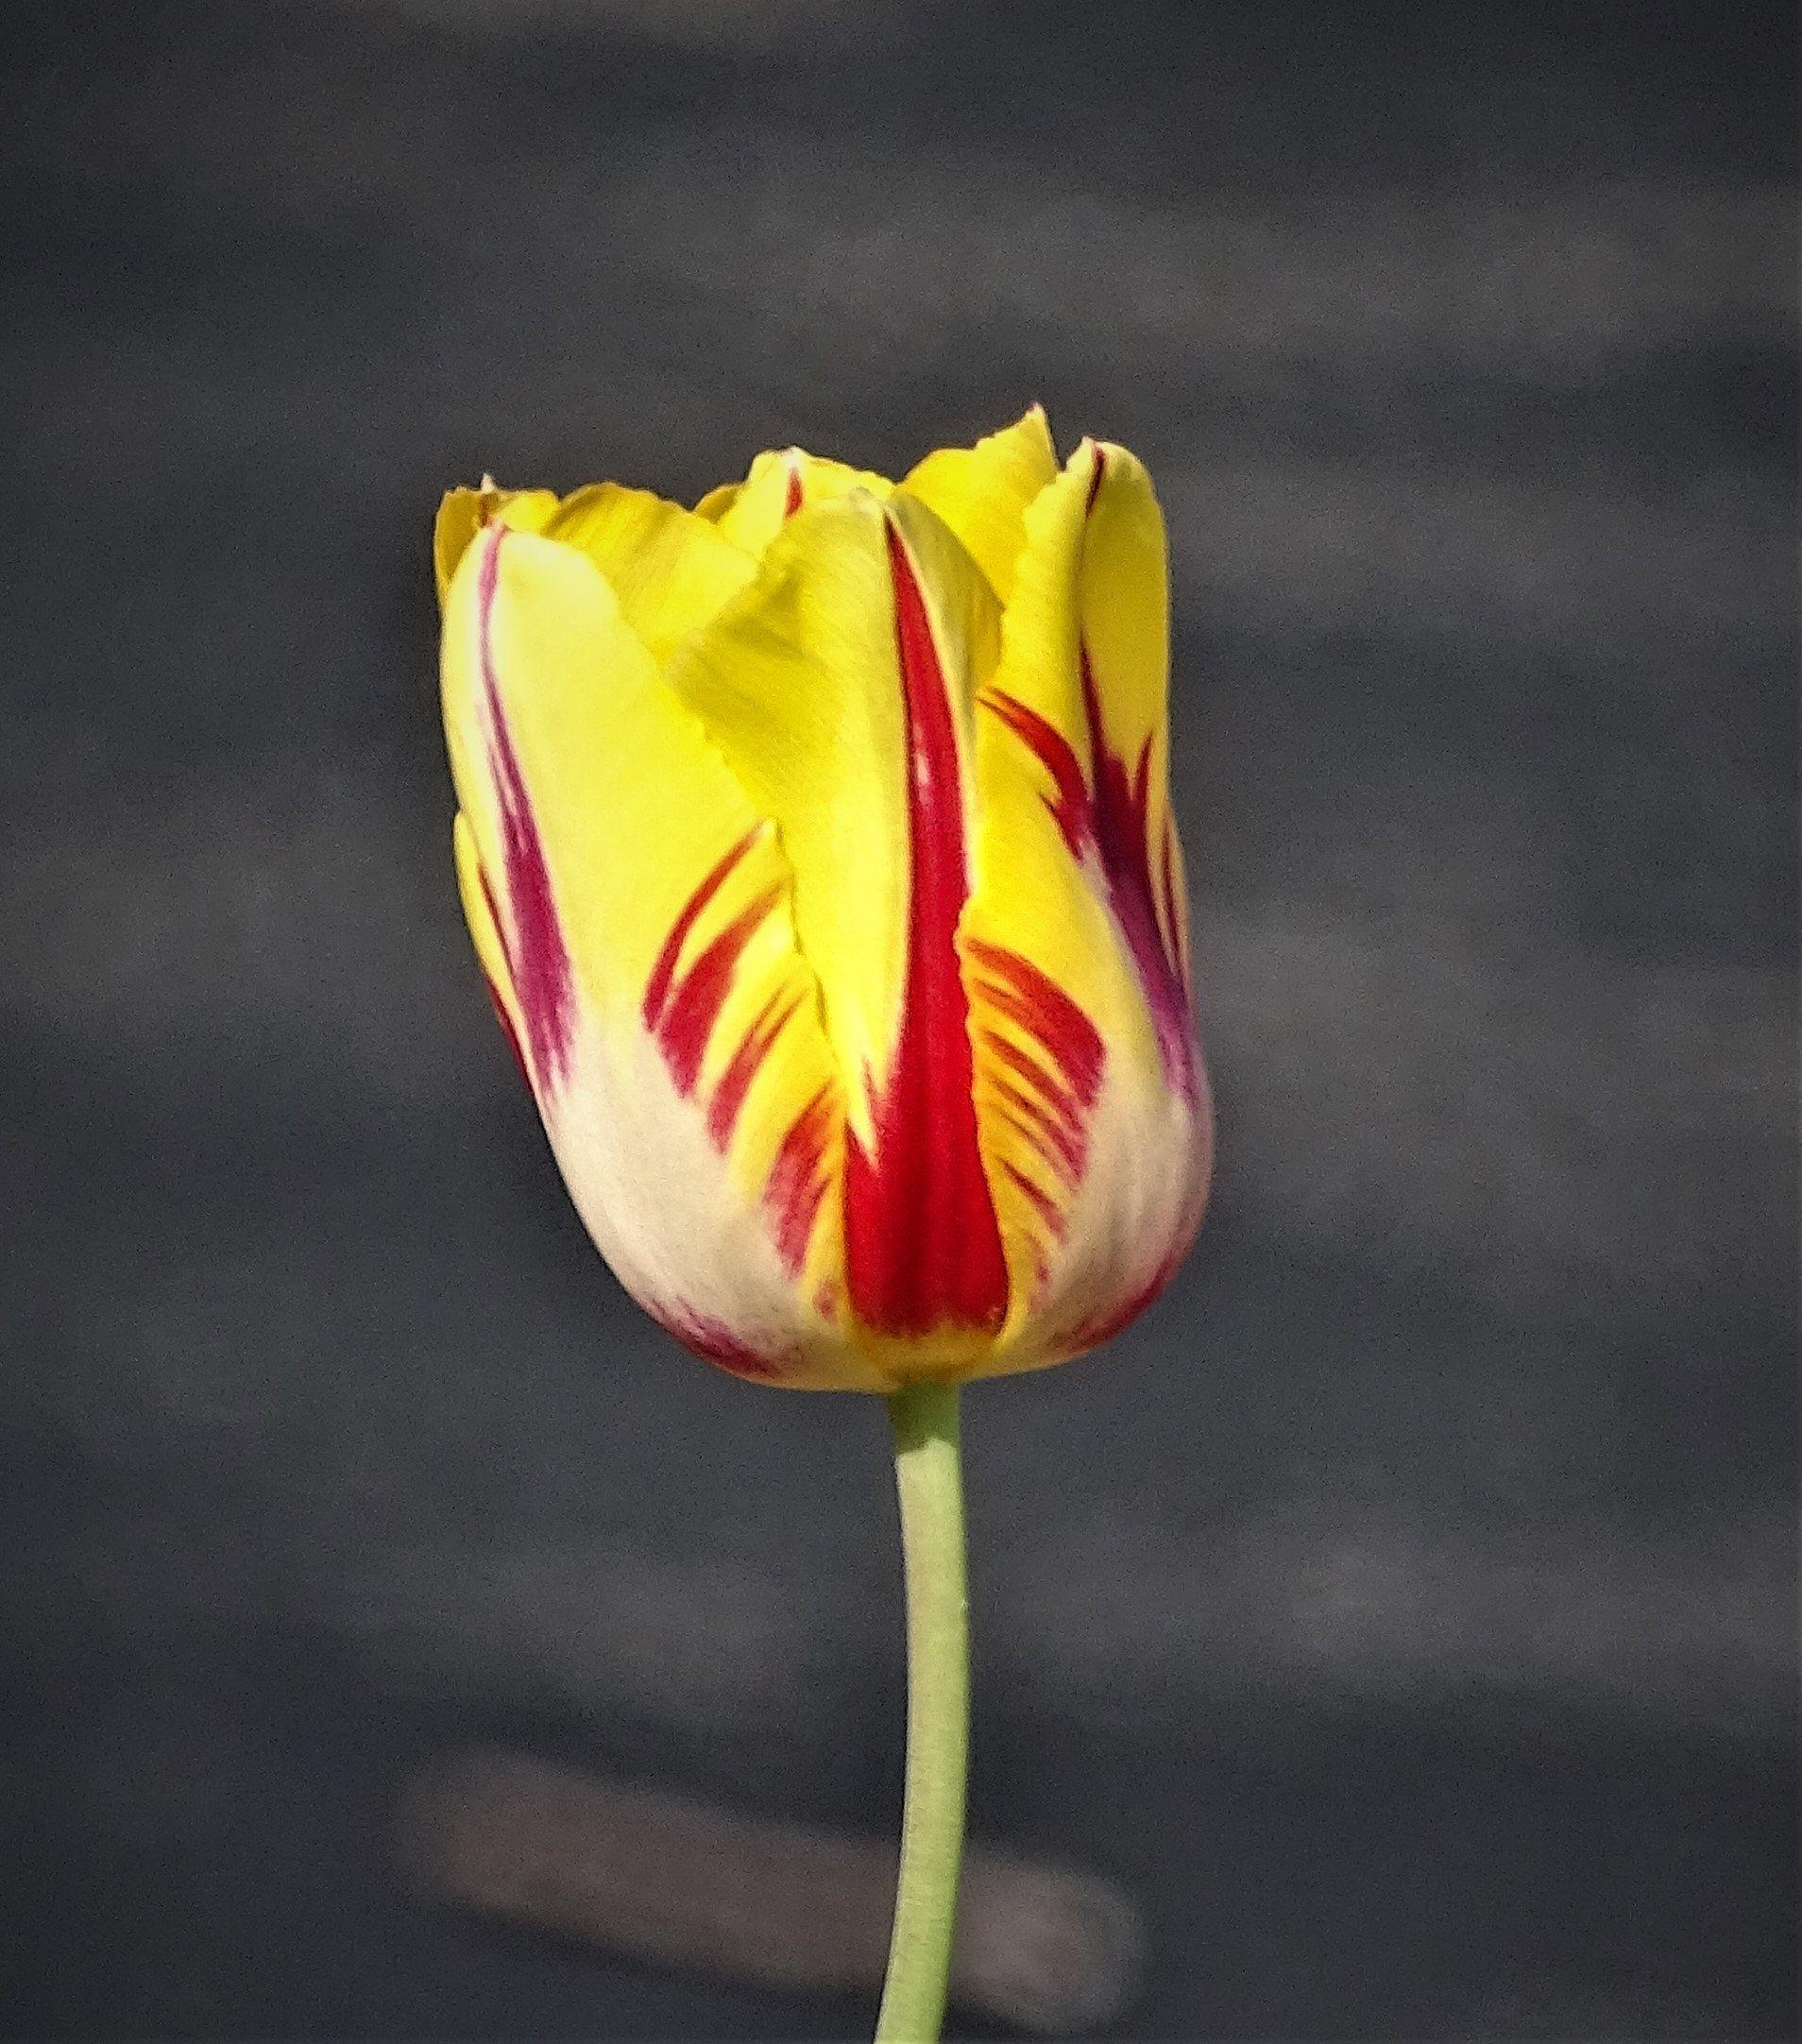 Yellow Flower Instant Download Digital Download Photography Etsy Yellow Flowers Digital Download Photography Flowers Photography